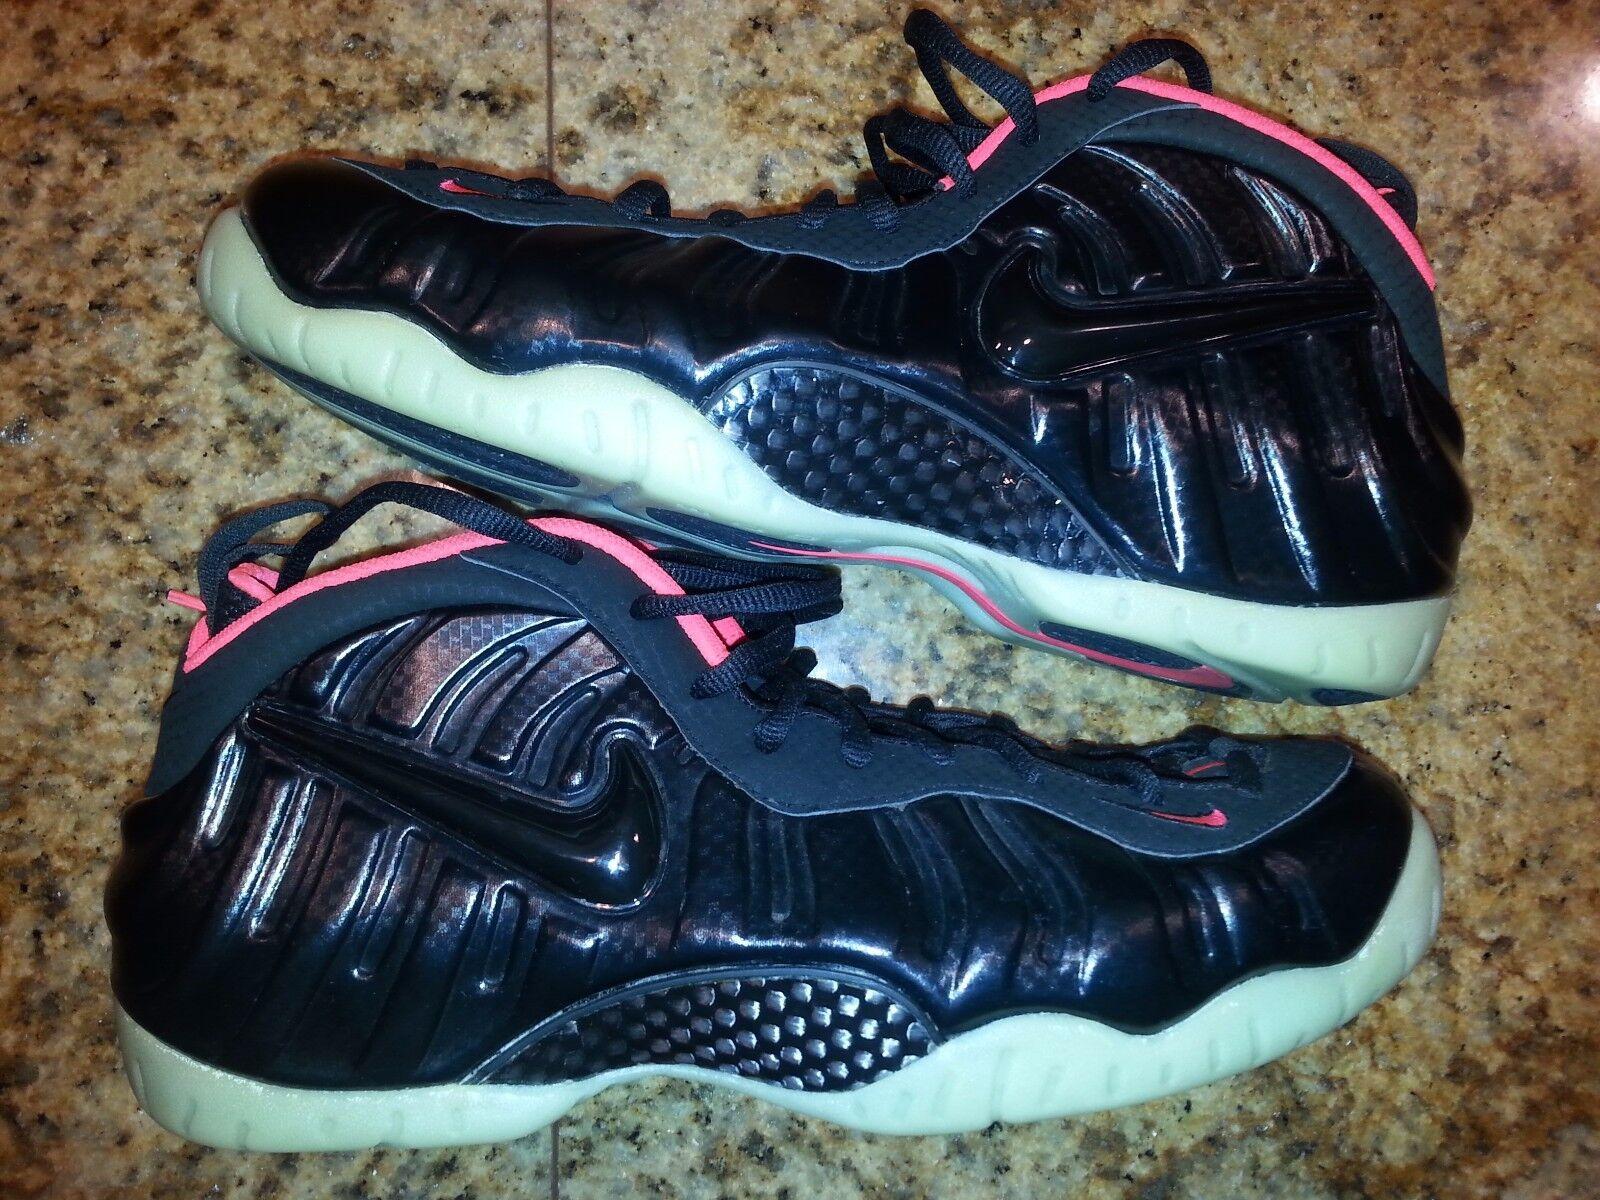 Nike air foamposite yeezy ridotta dimensione 616750-001 jordan penny 1 2 3 4 5 6